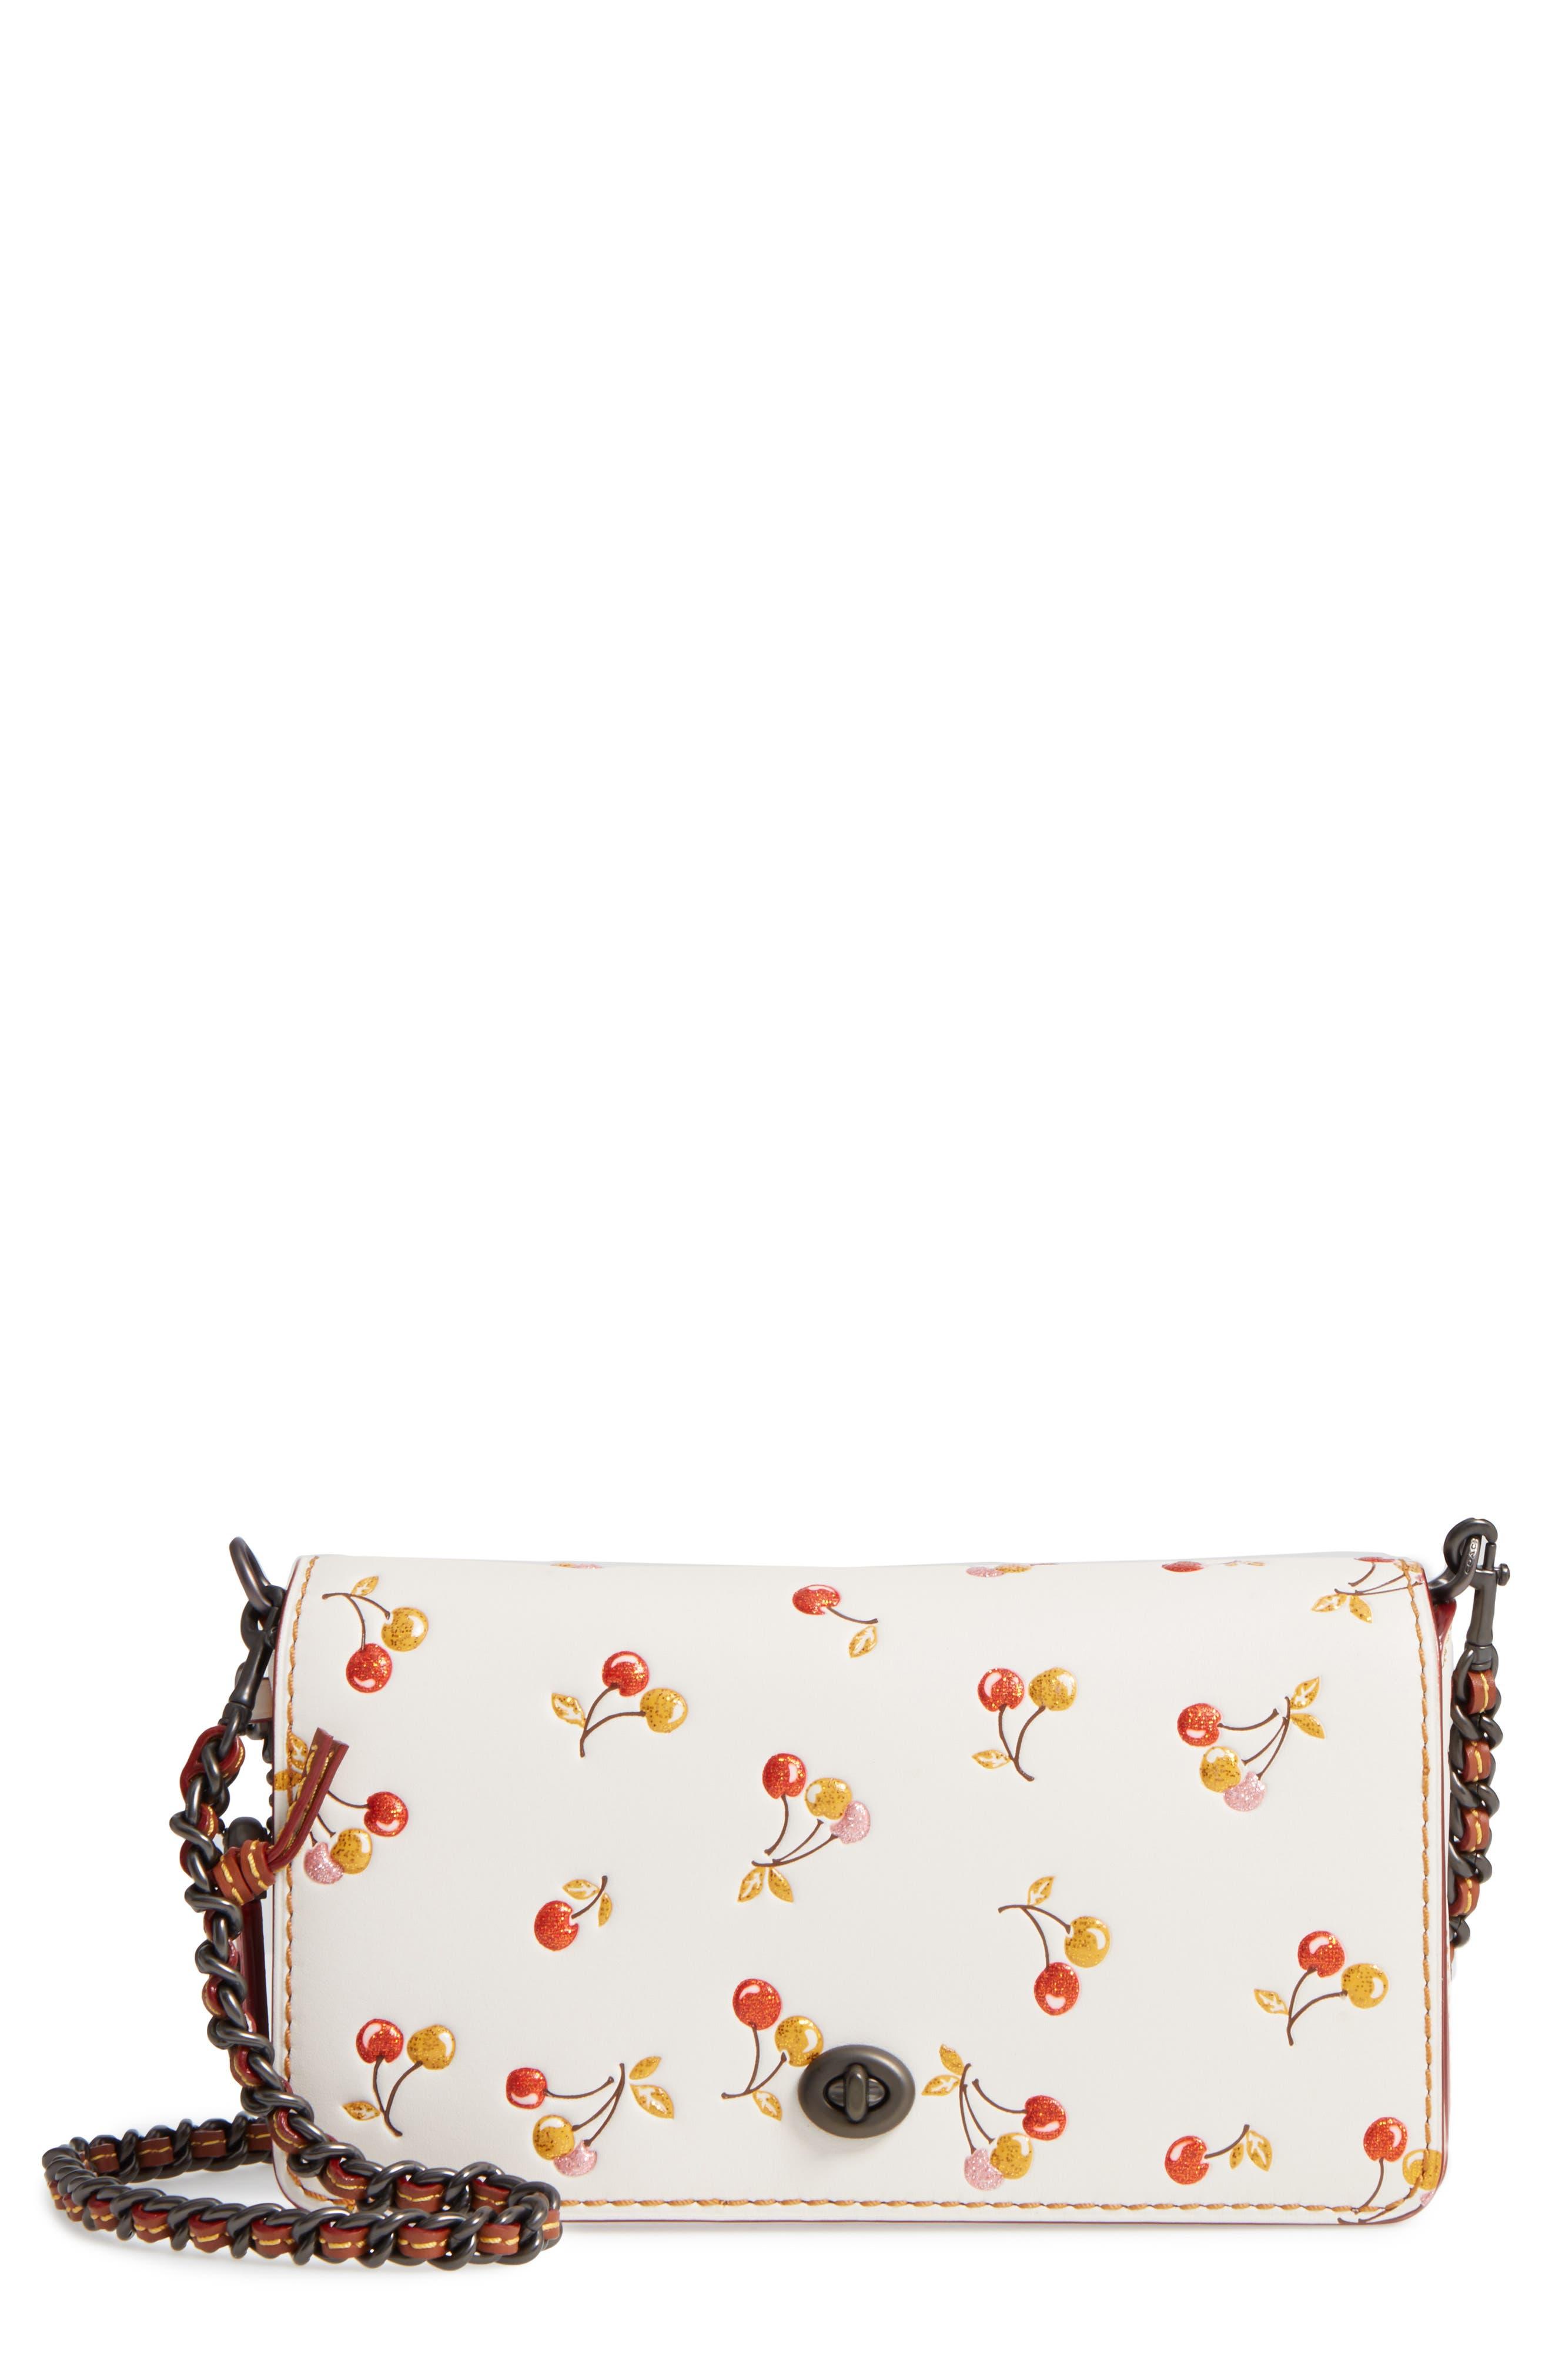 Cherries Dinky Leather Crossbody Bag,                             Main thumbnail 1, color,                             250